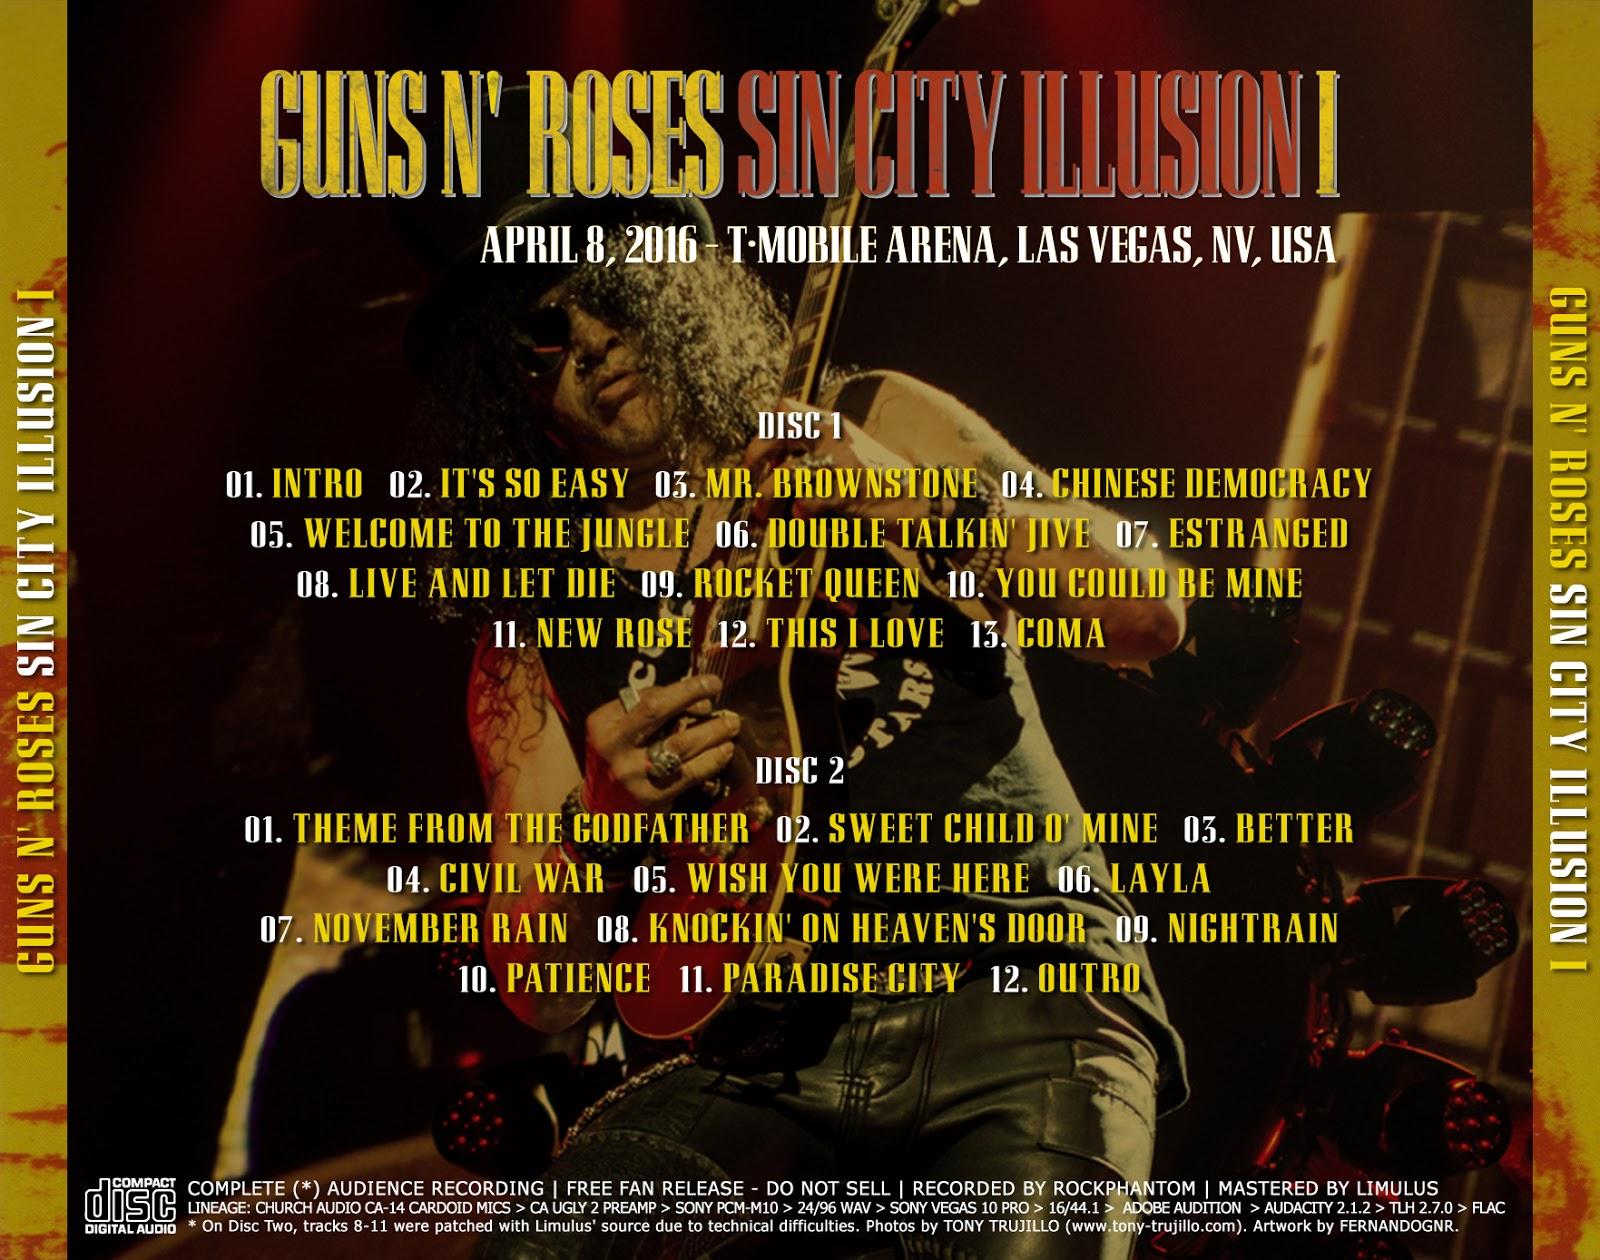 guns n roses full discography download